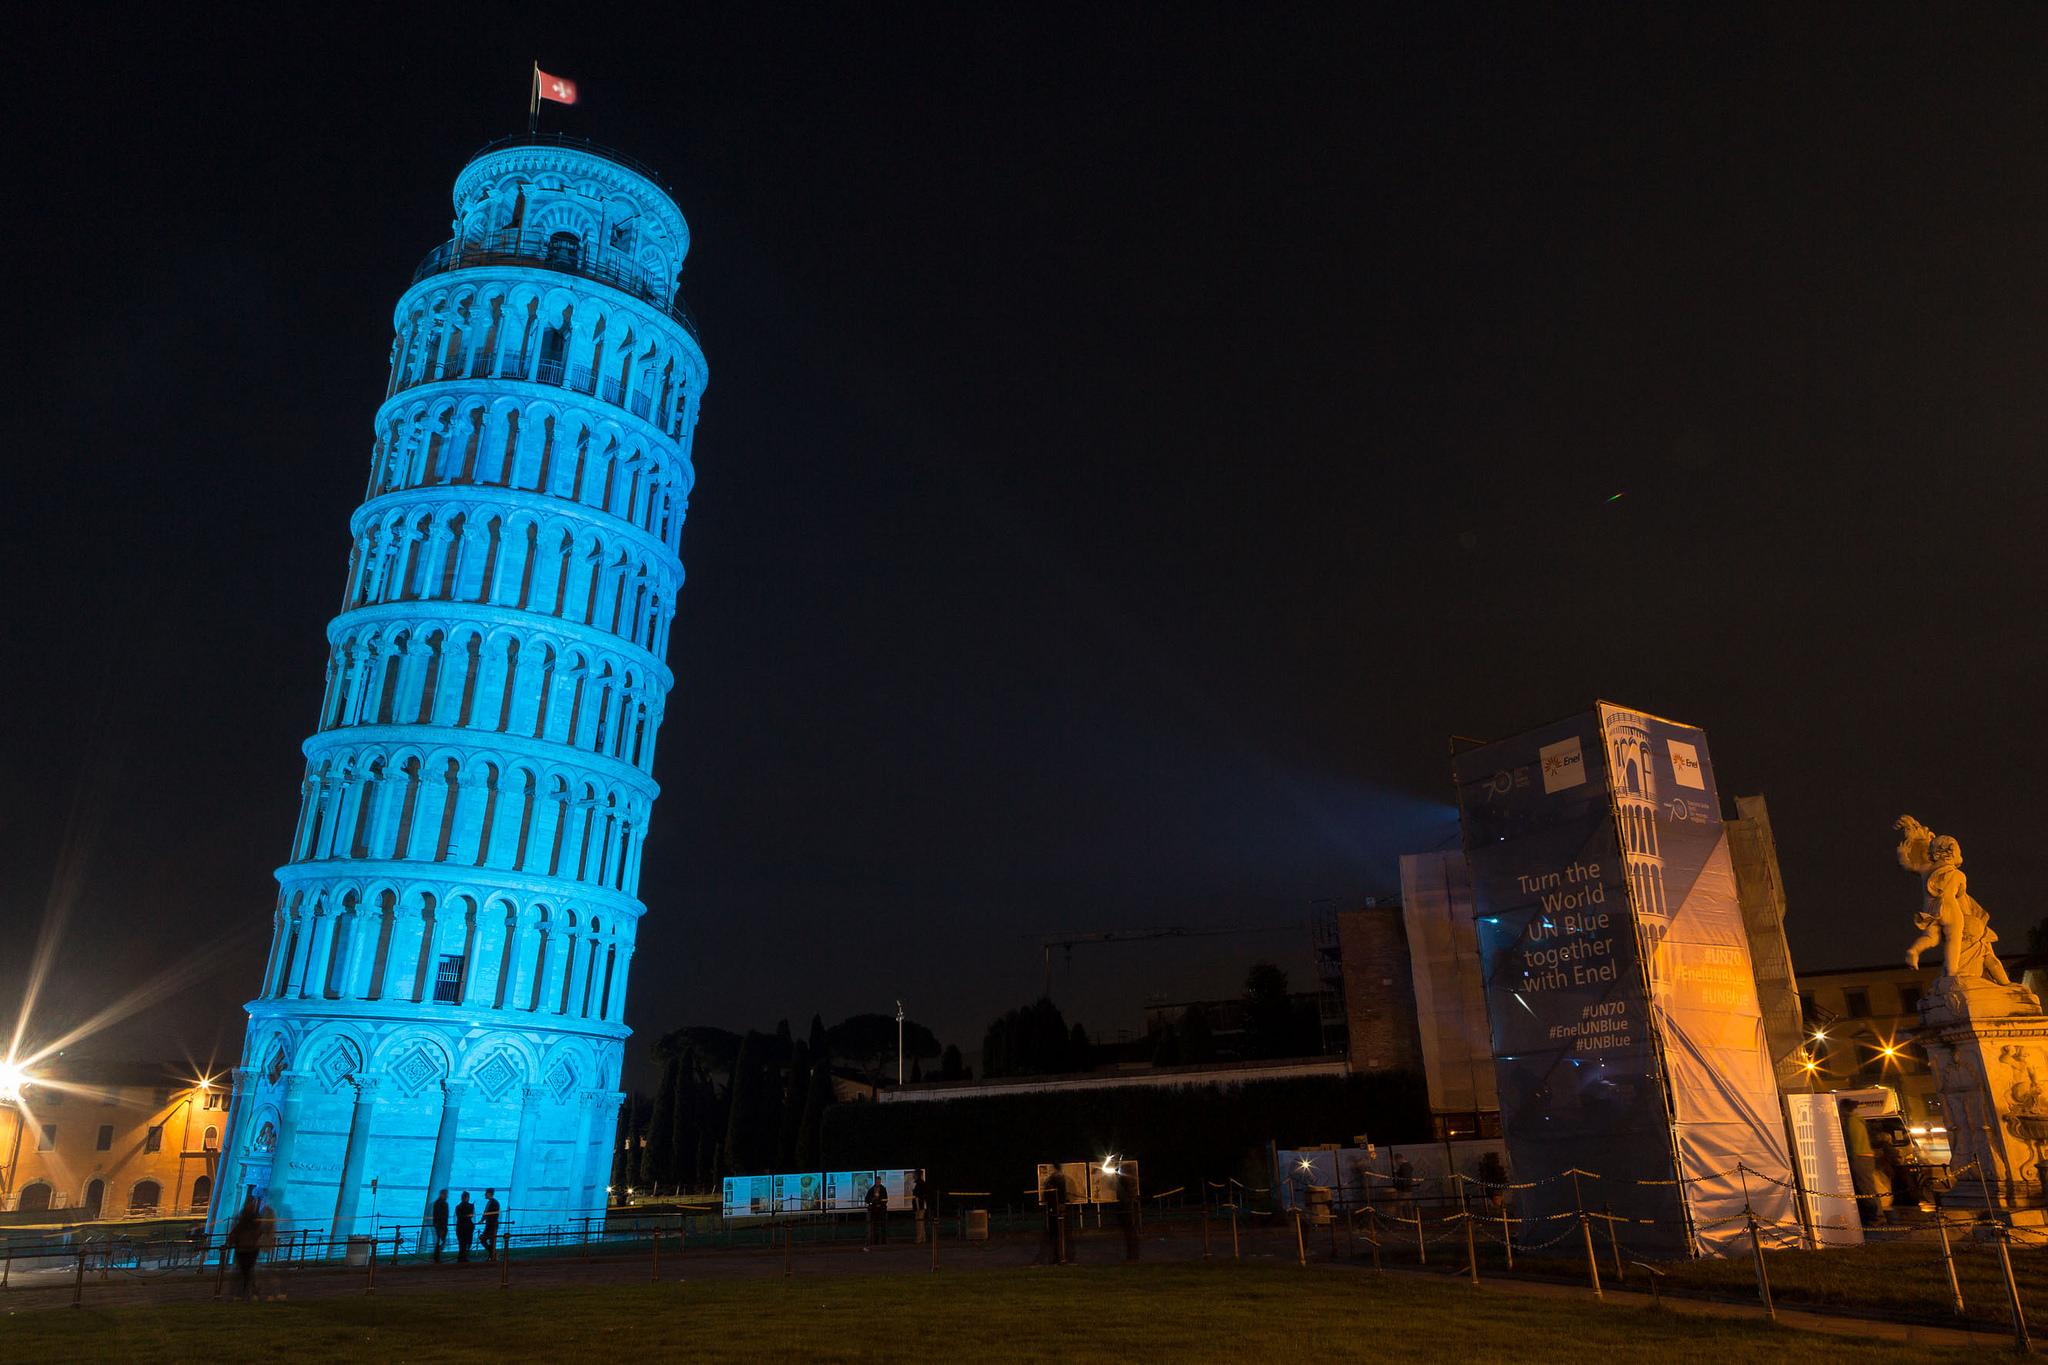 Pisa Leaning Tower, Piazza del Duomo, Italy. Credit: Luca Briganti for Enel/ UN Information Centre/ Flickr